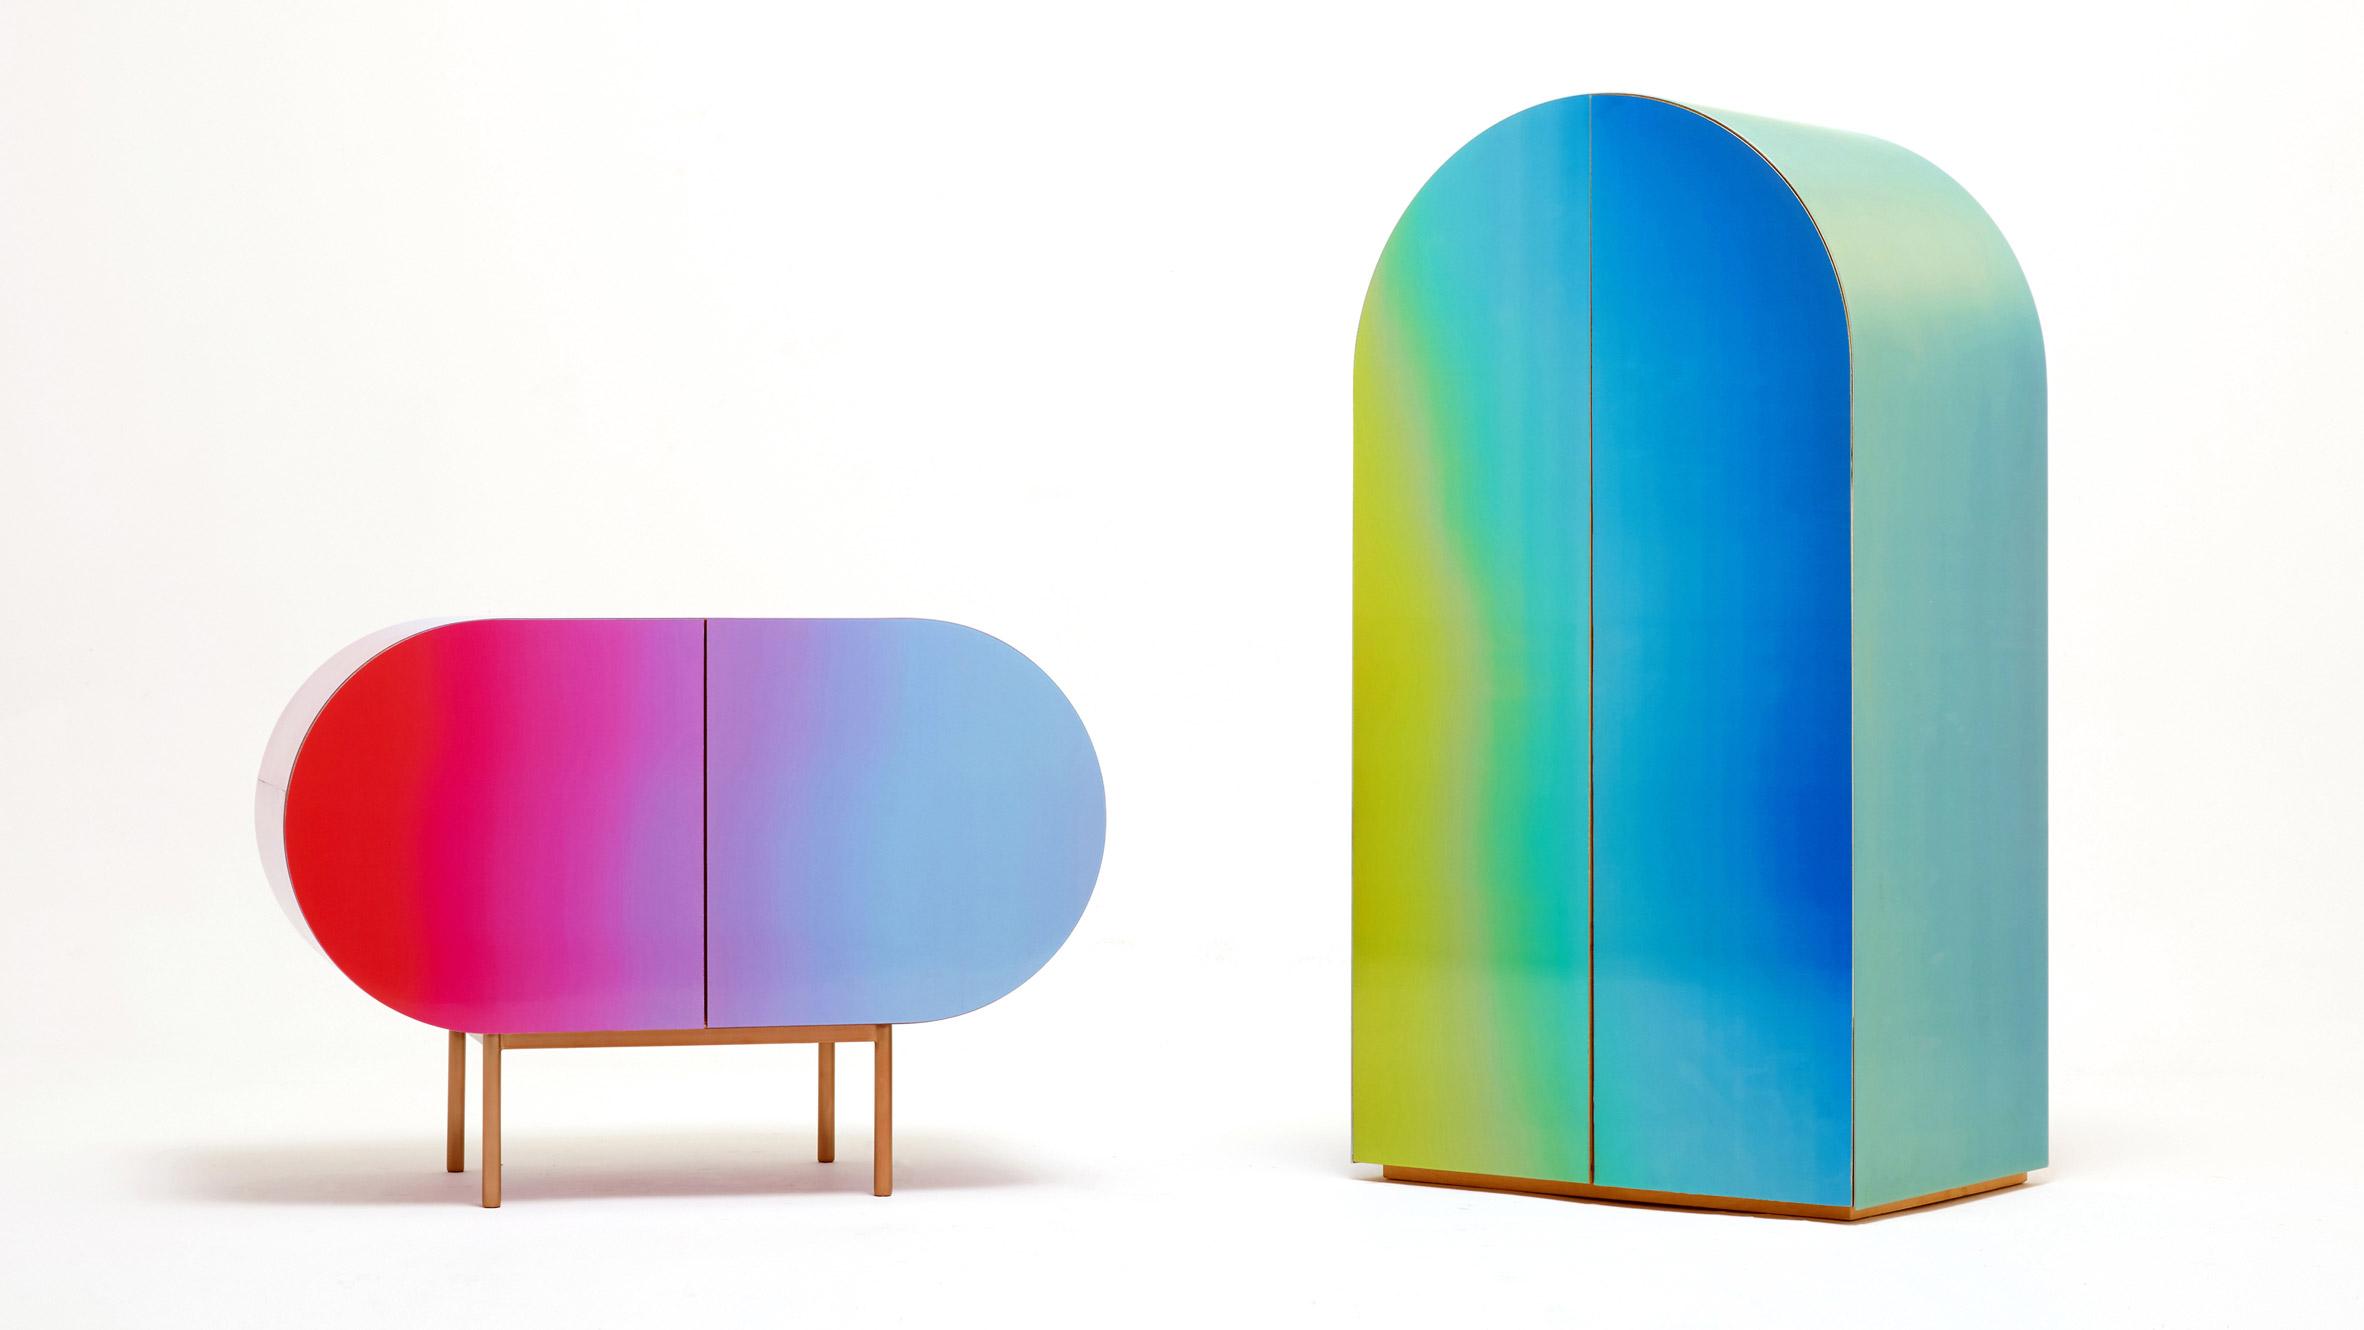 Orijeenu0027s Rainbow Hued Furniture Uses Lenticular Surfaces To Change Colour